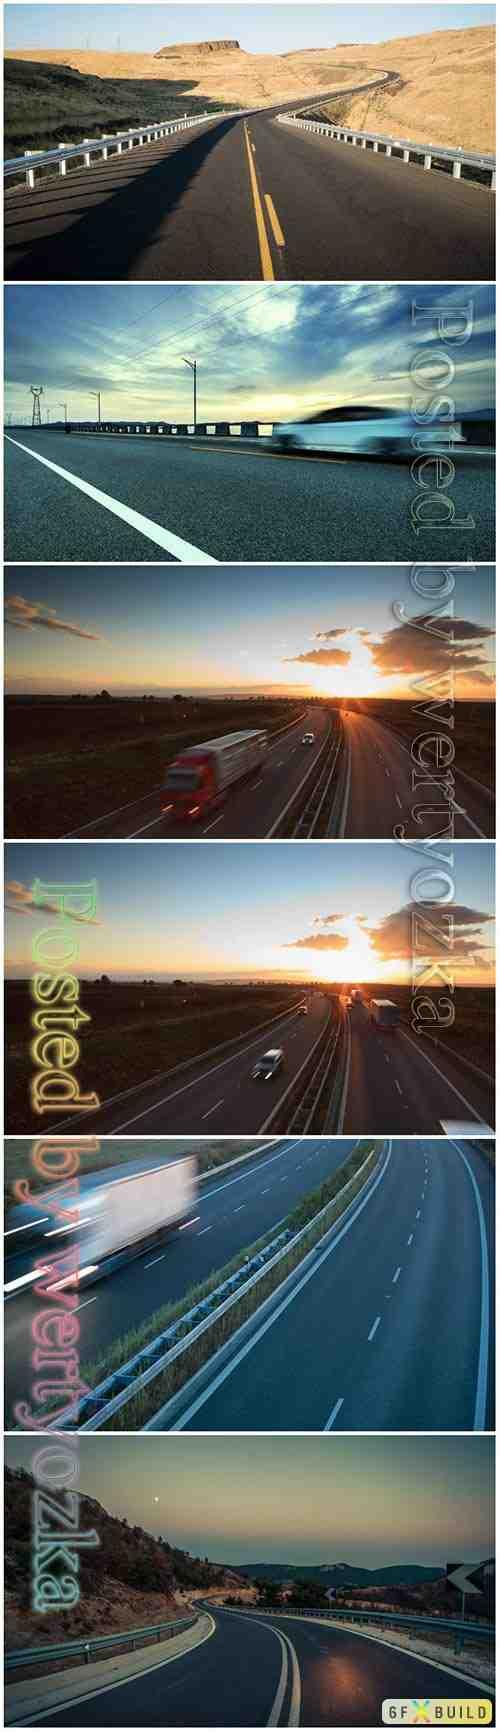 Highway traffic motion beautiful stock photo